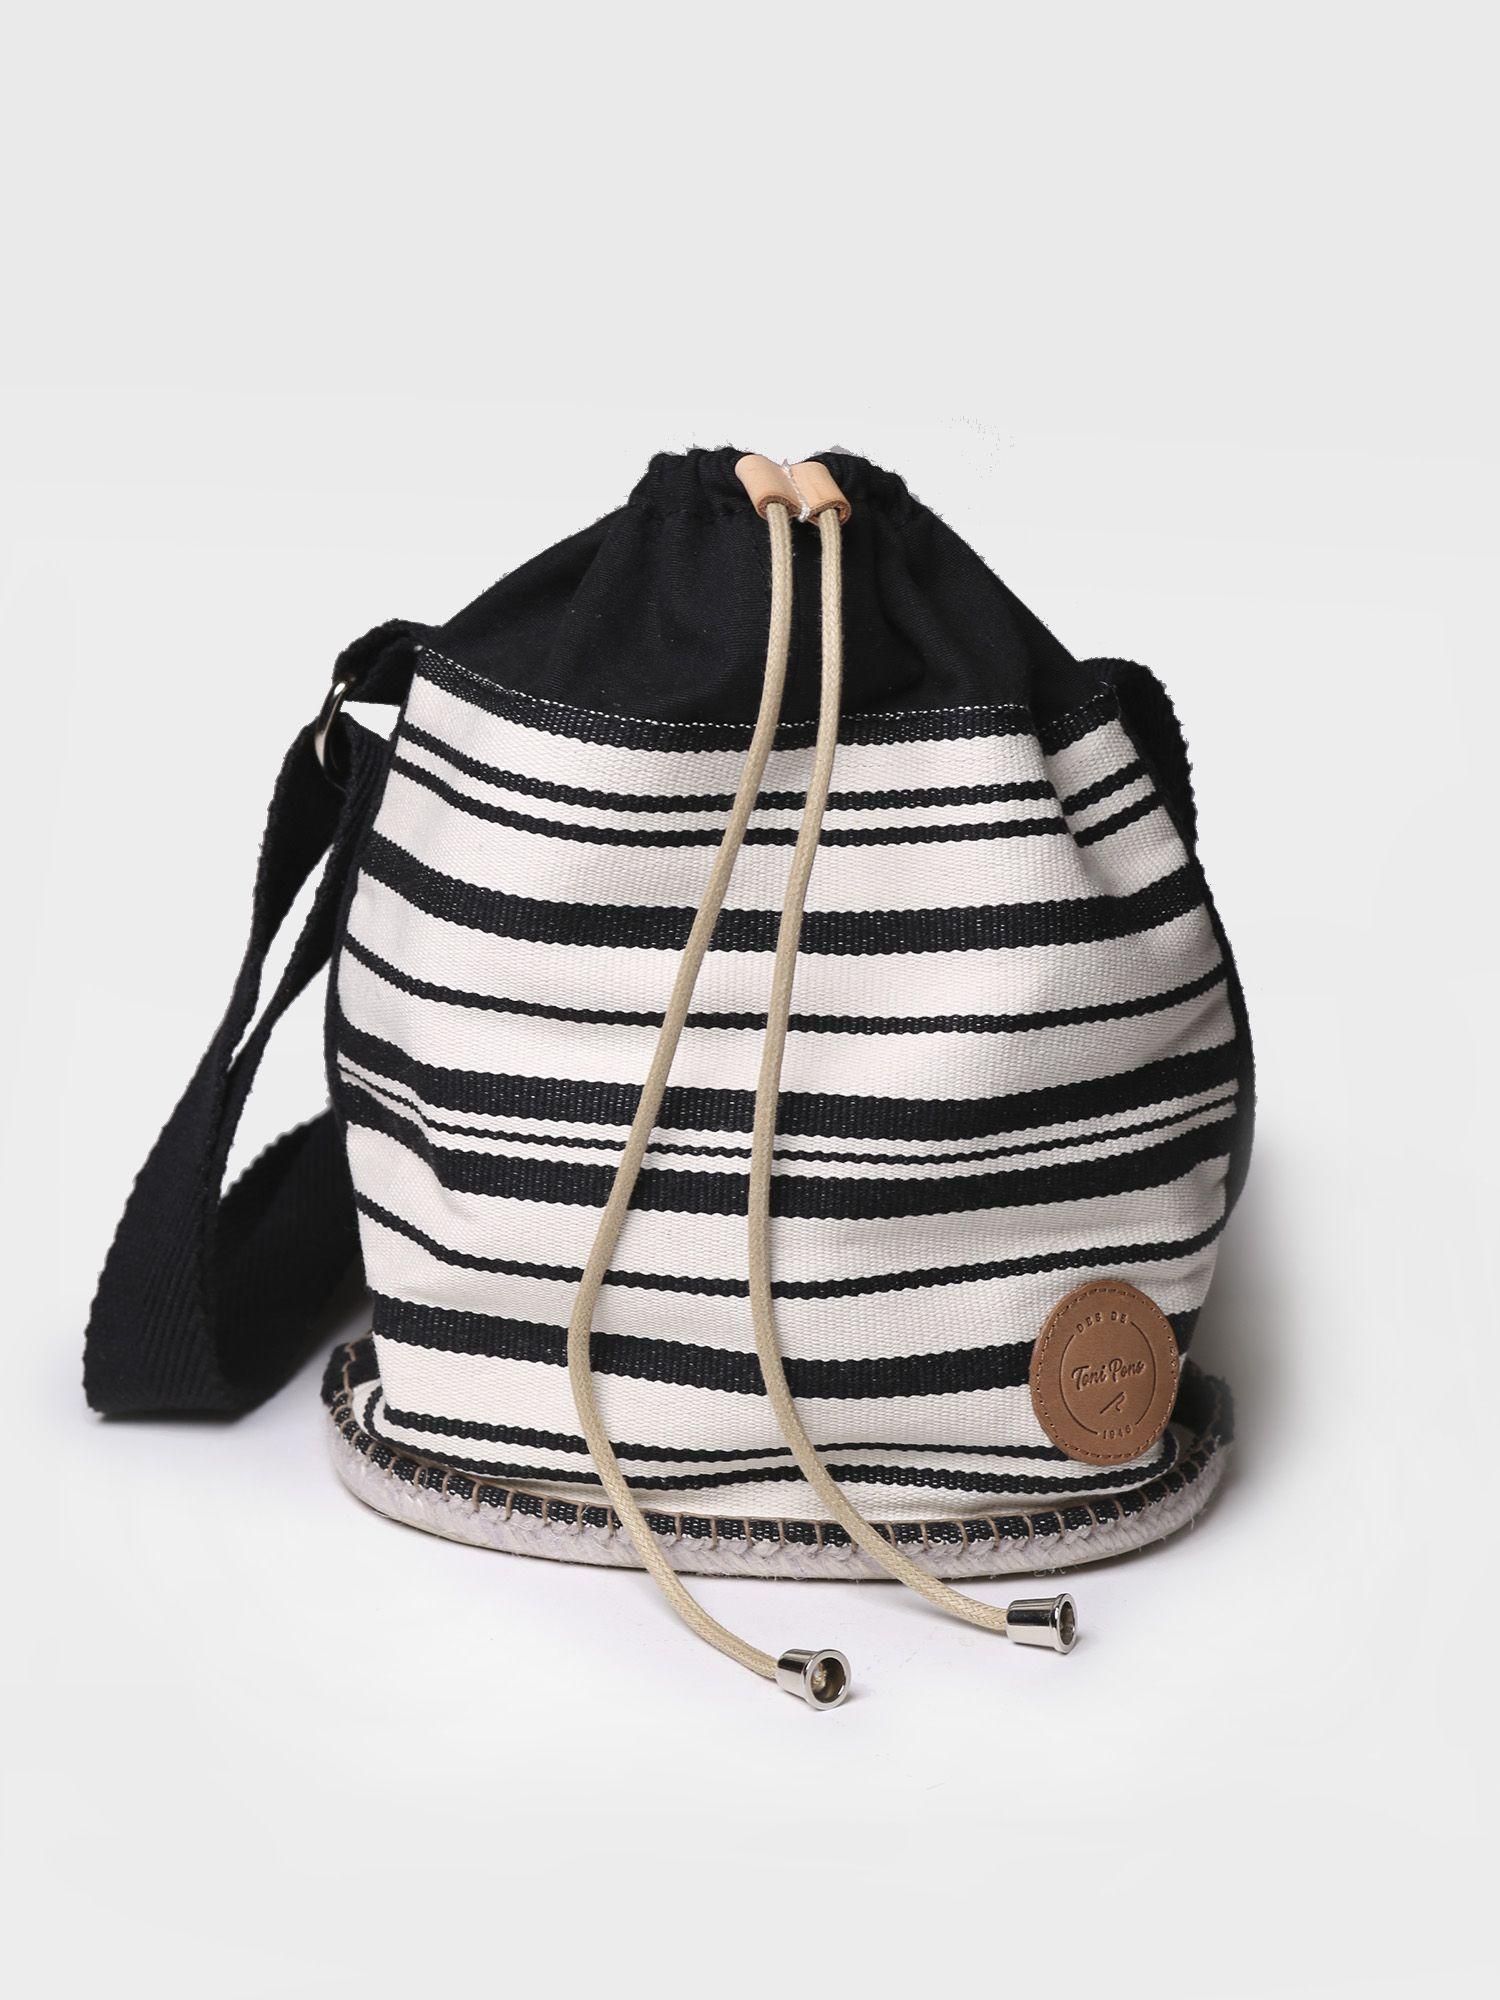 Summer handbag - GLORIA